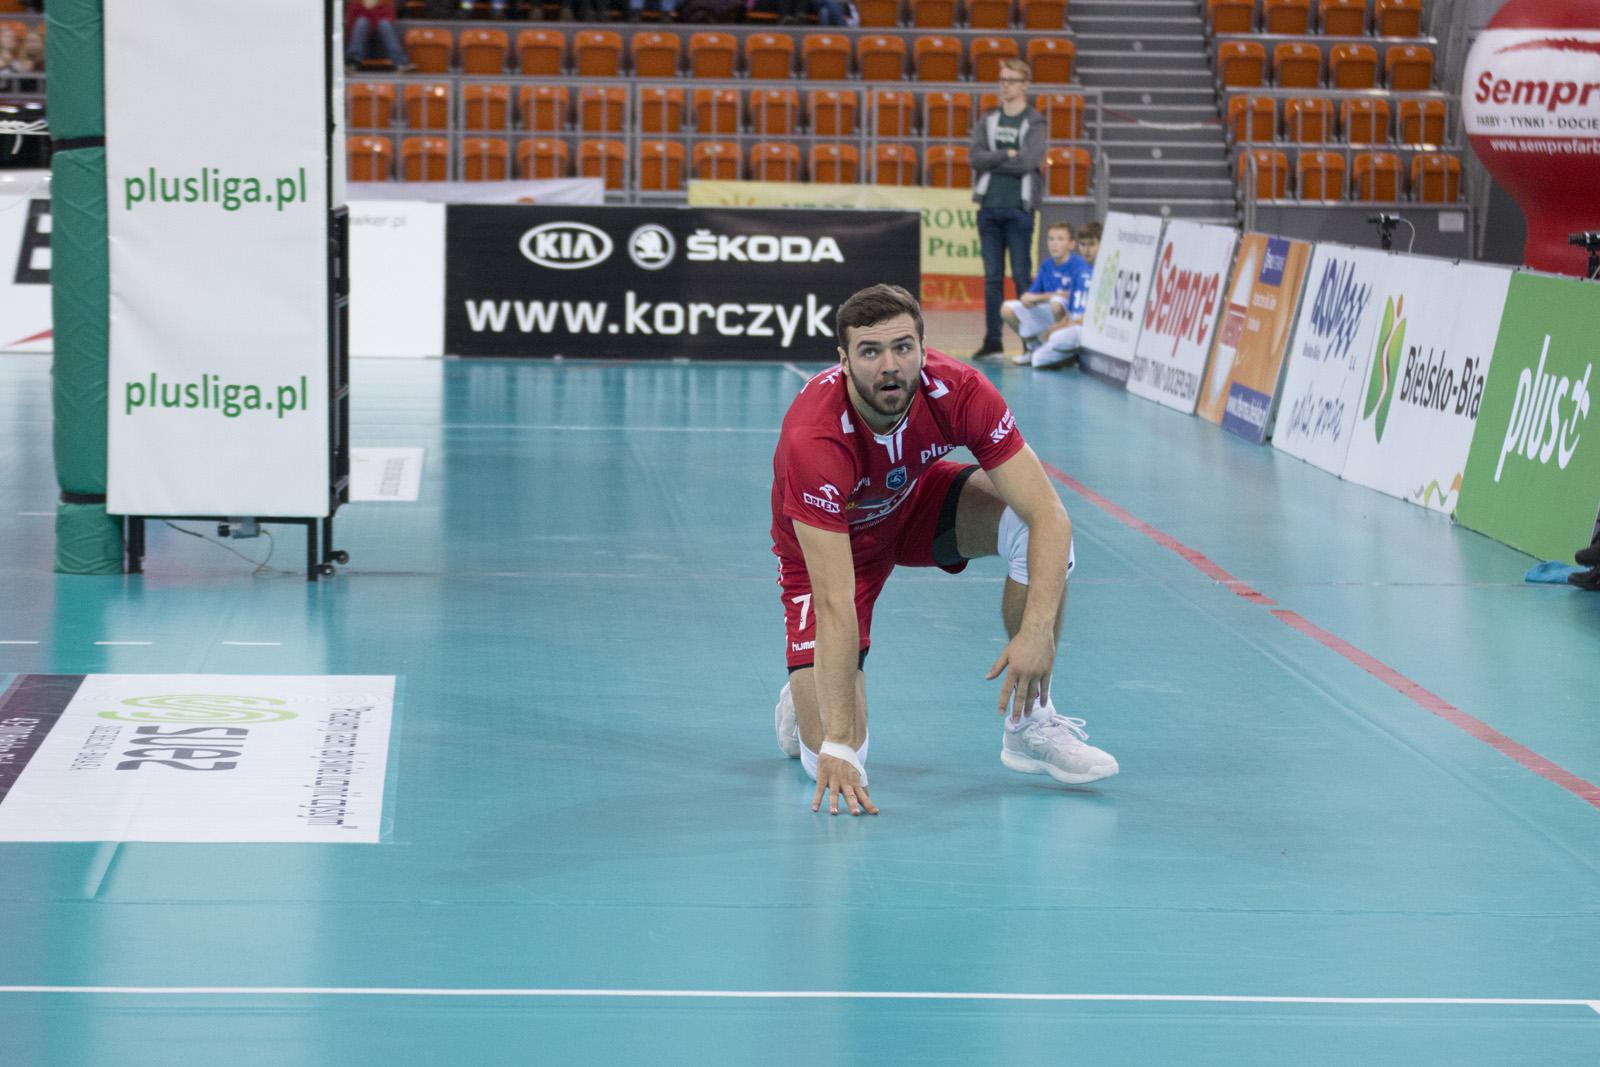 60 - Jakub Wachnik